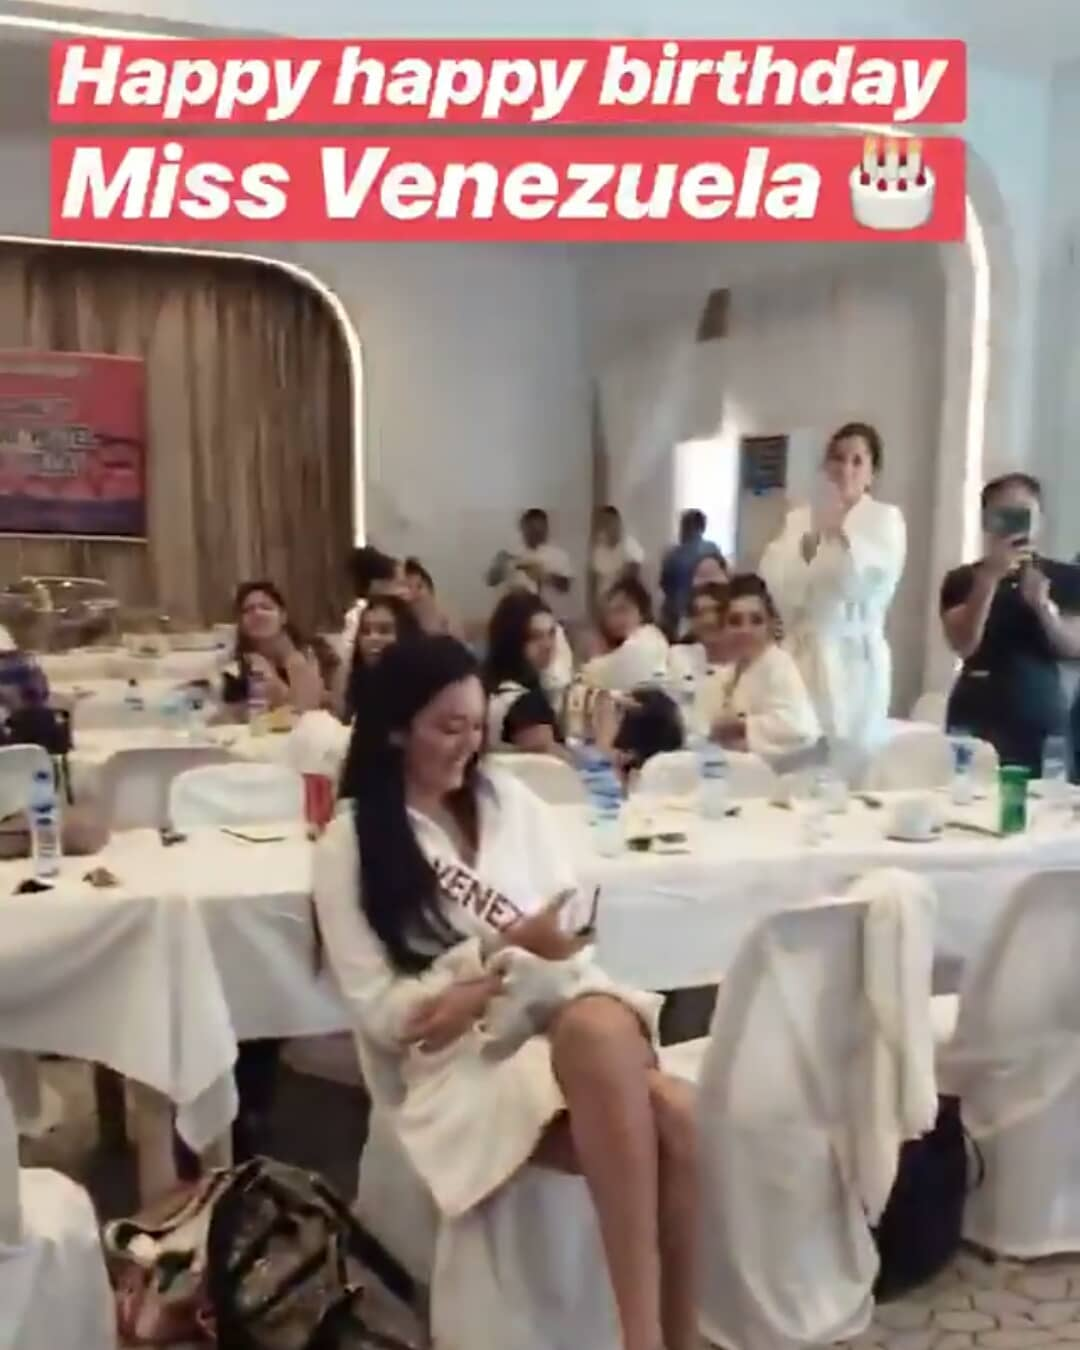 mariani chacon, 4th runner-up de miss asia pacific international 2018. - Página 4 41720610